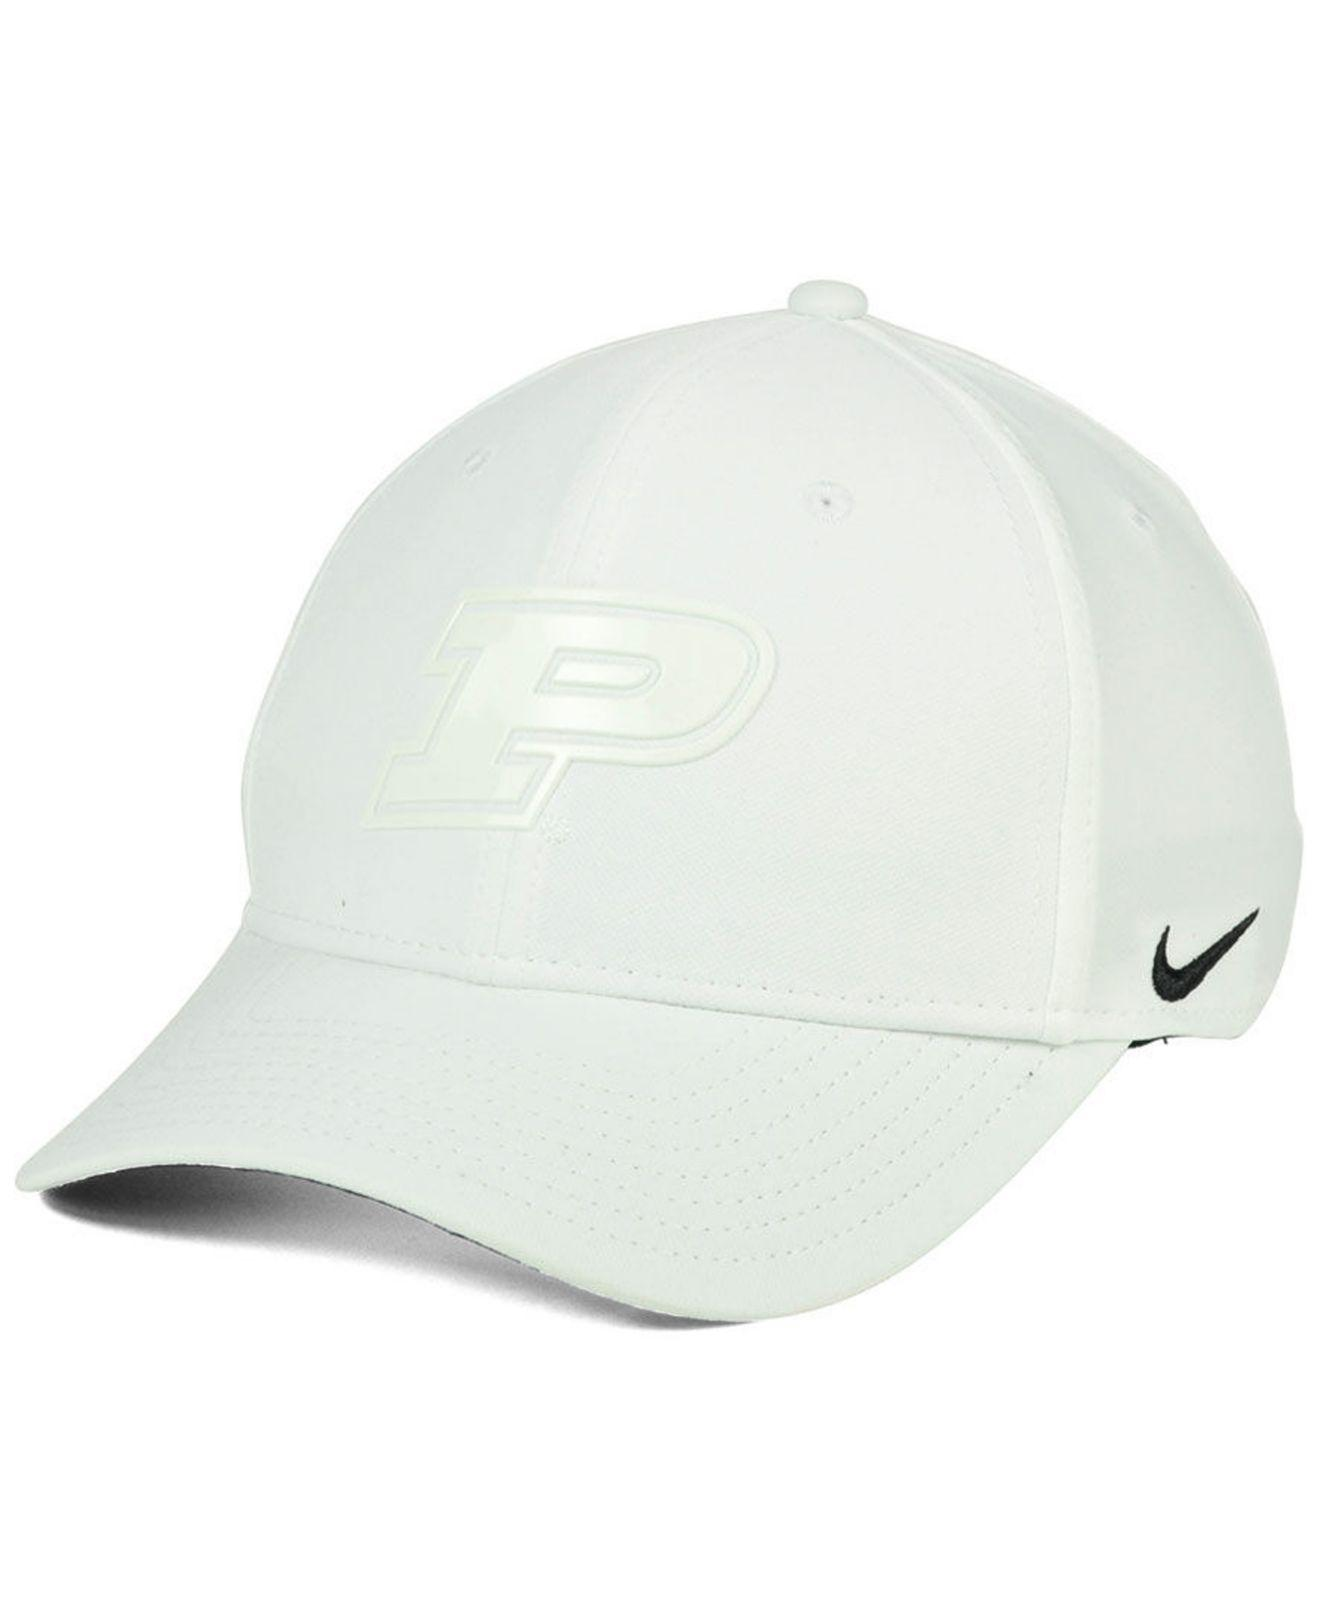 hot sale online 552aa f479c top quality purdue nike hat fe633 c0654